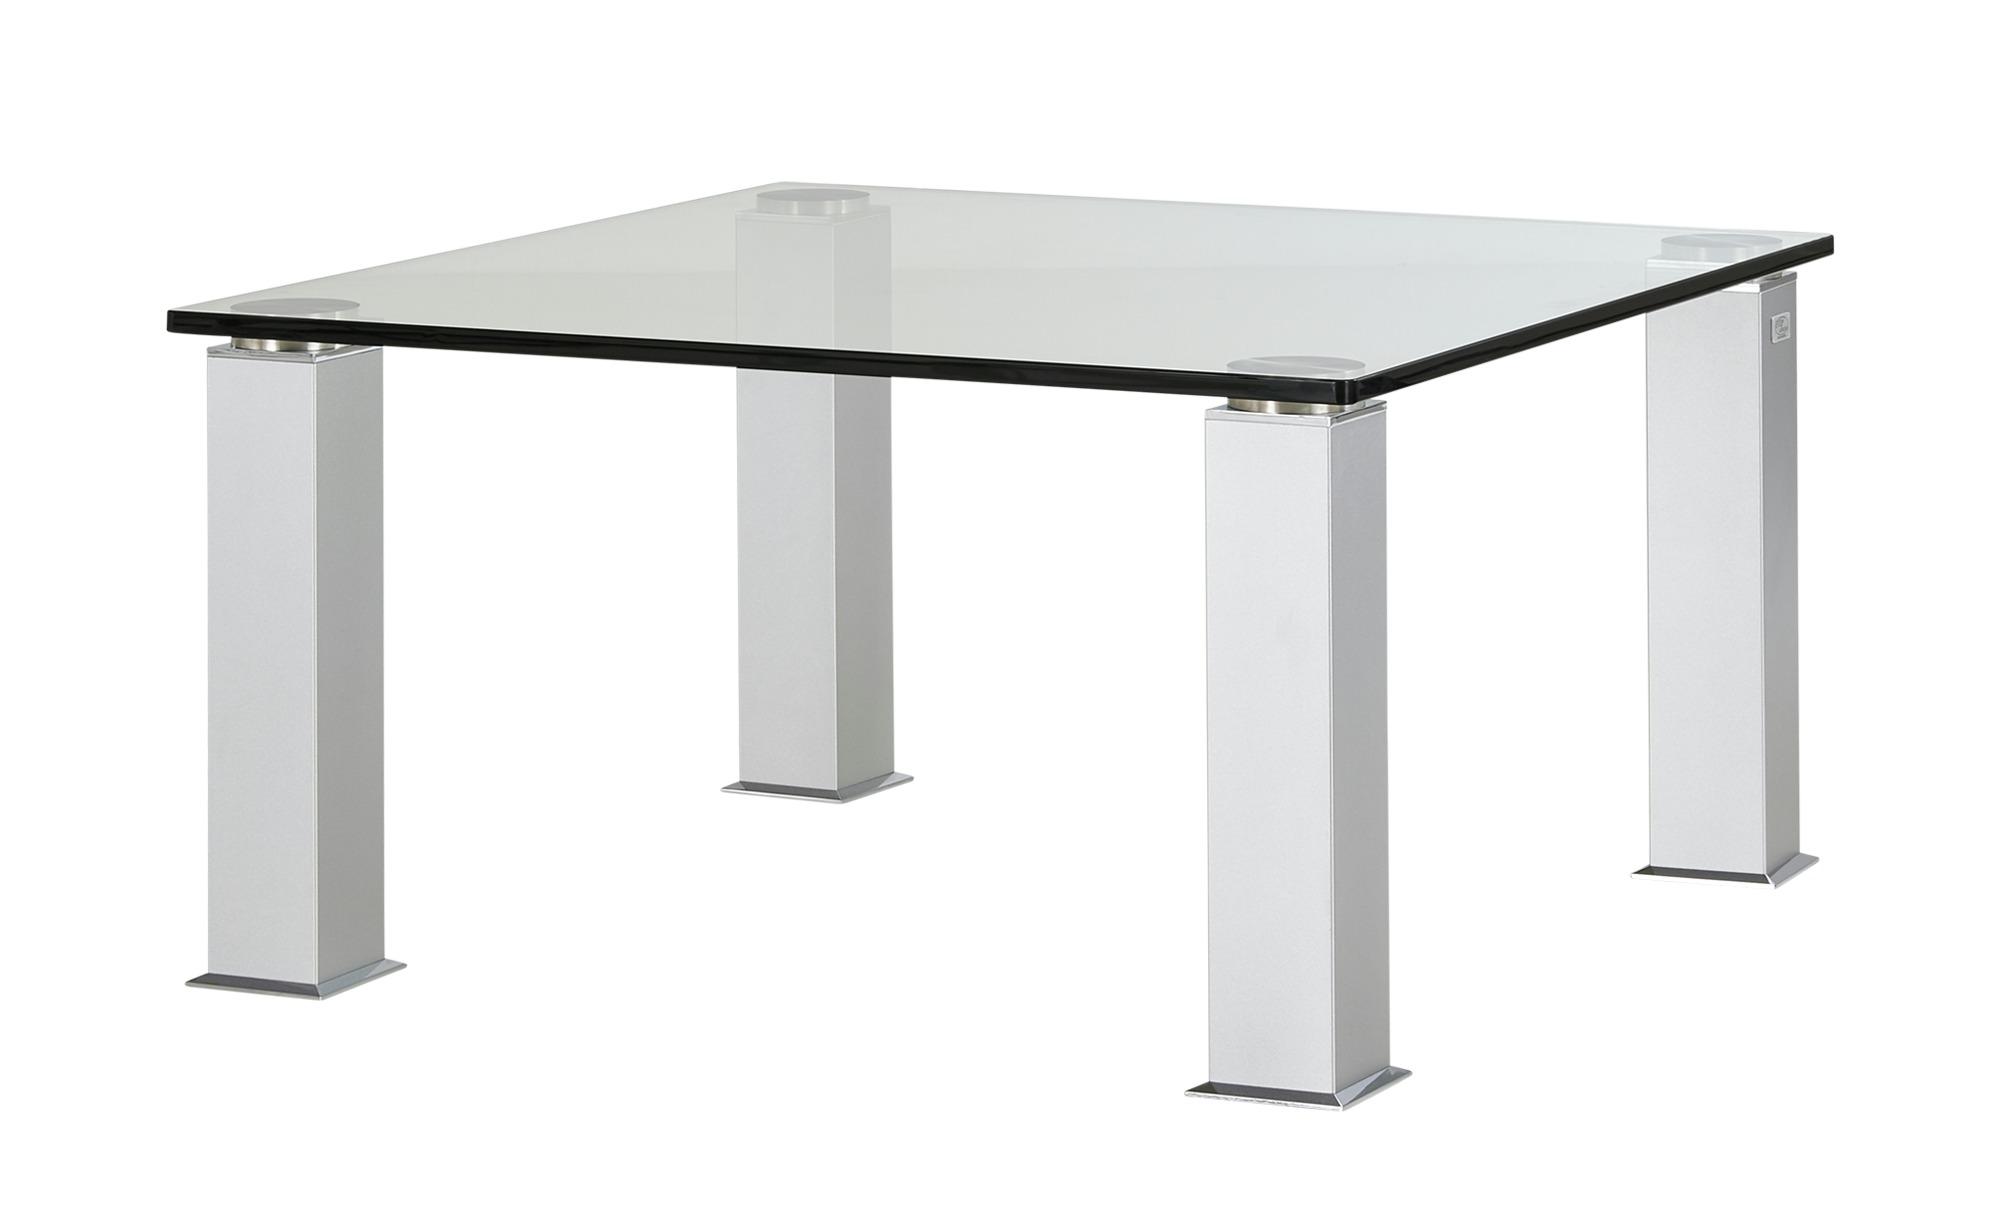 Couchtisch  Rimini ¦ Maße (cm): B: 80 H: 42,5 T: 80 Tische > Couchtische > Couchtische rechteckig - Höffner